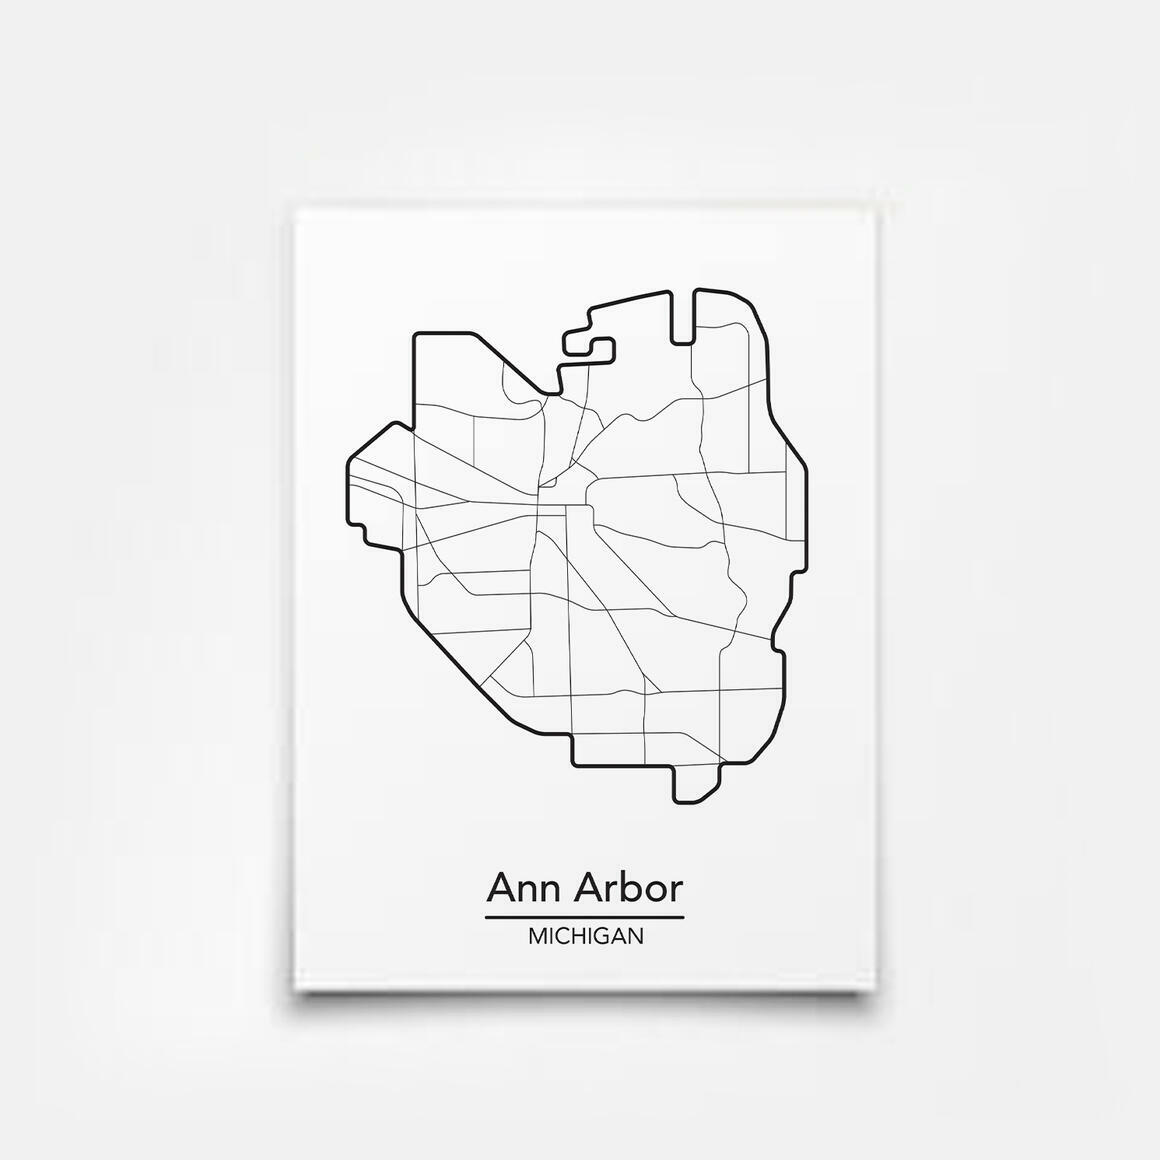 Ann Arbor, Michigan City Map Print   Trada Marketplace